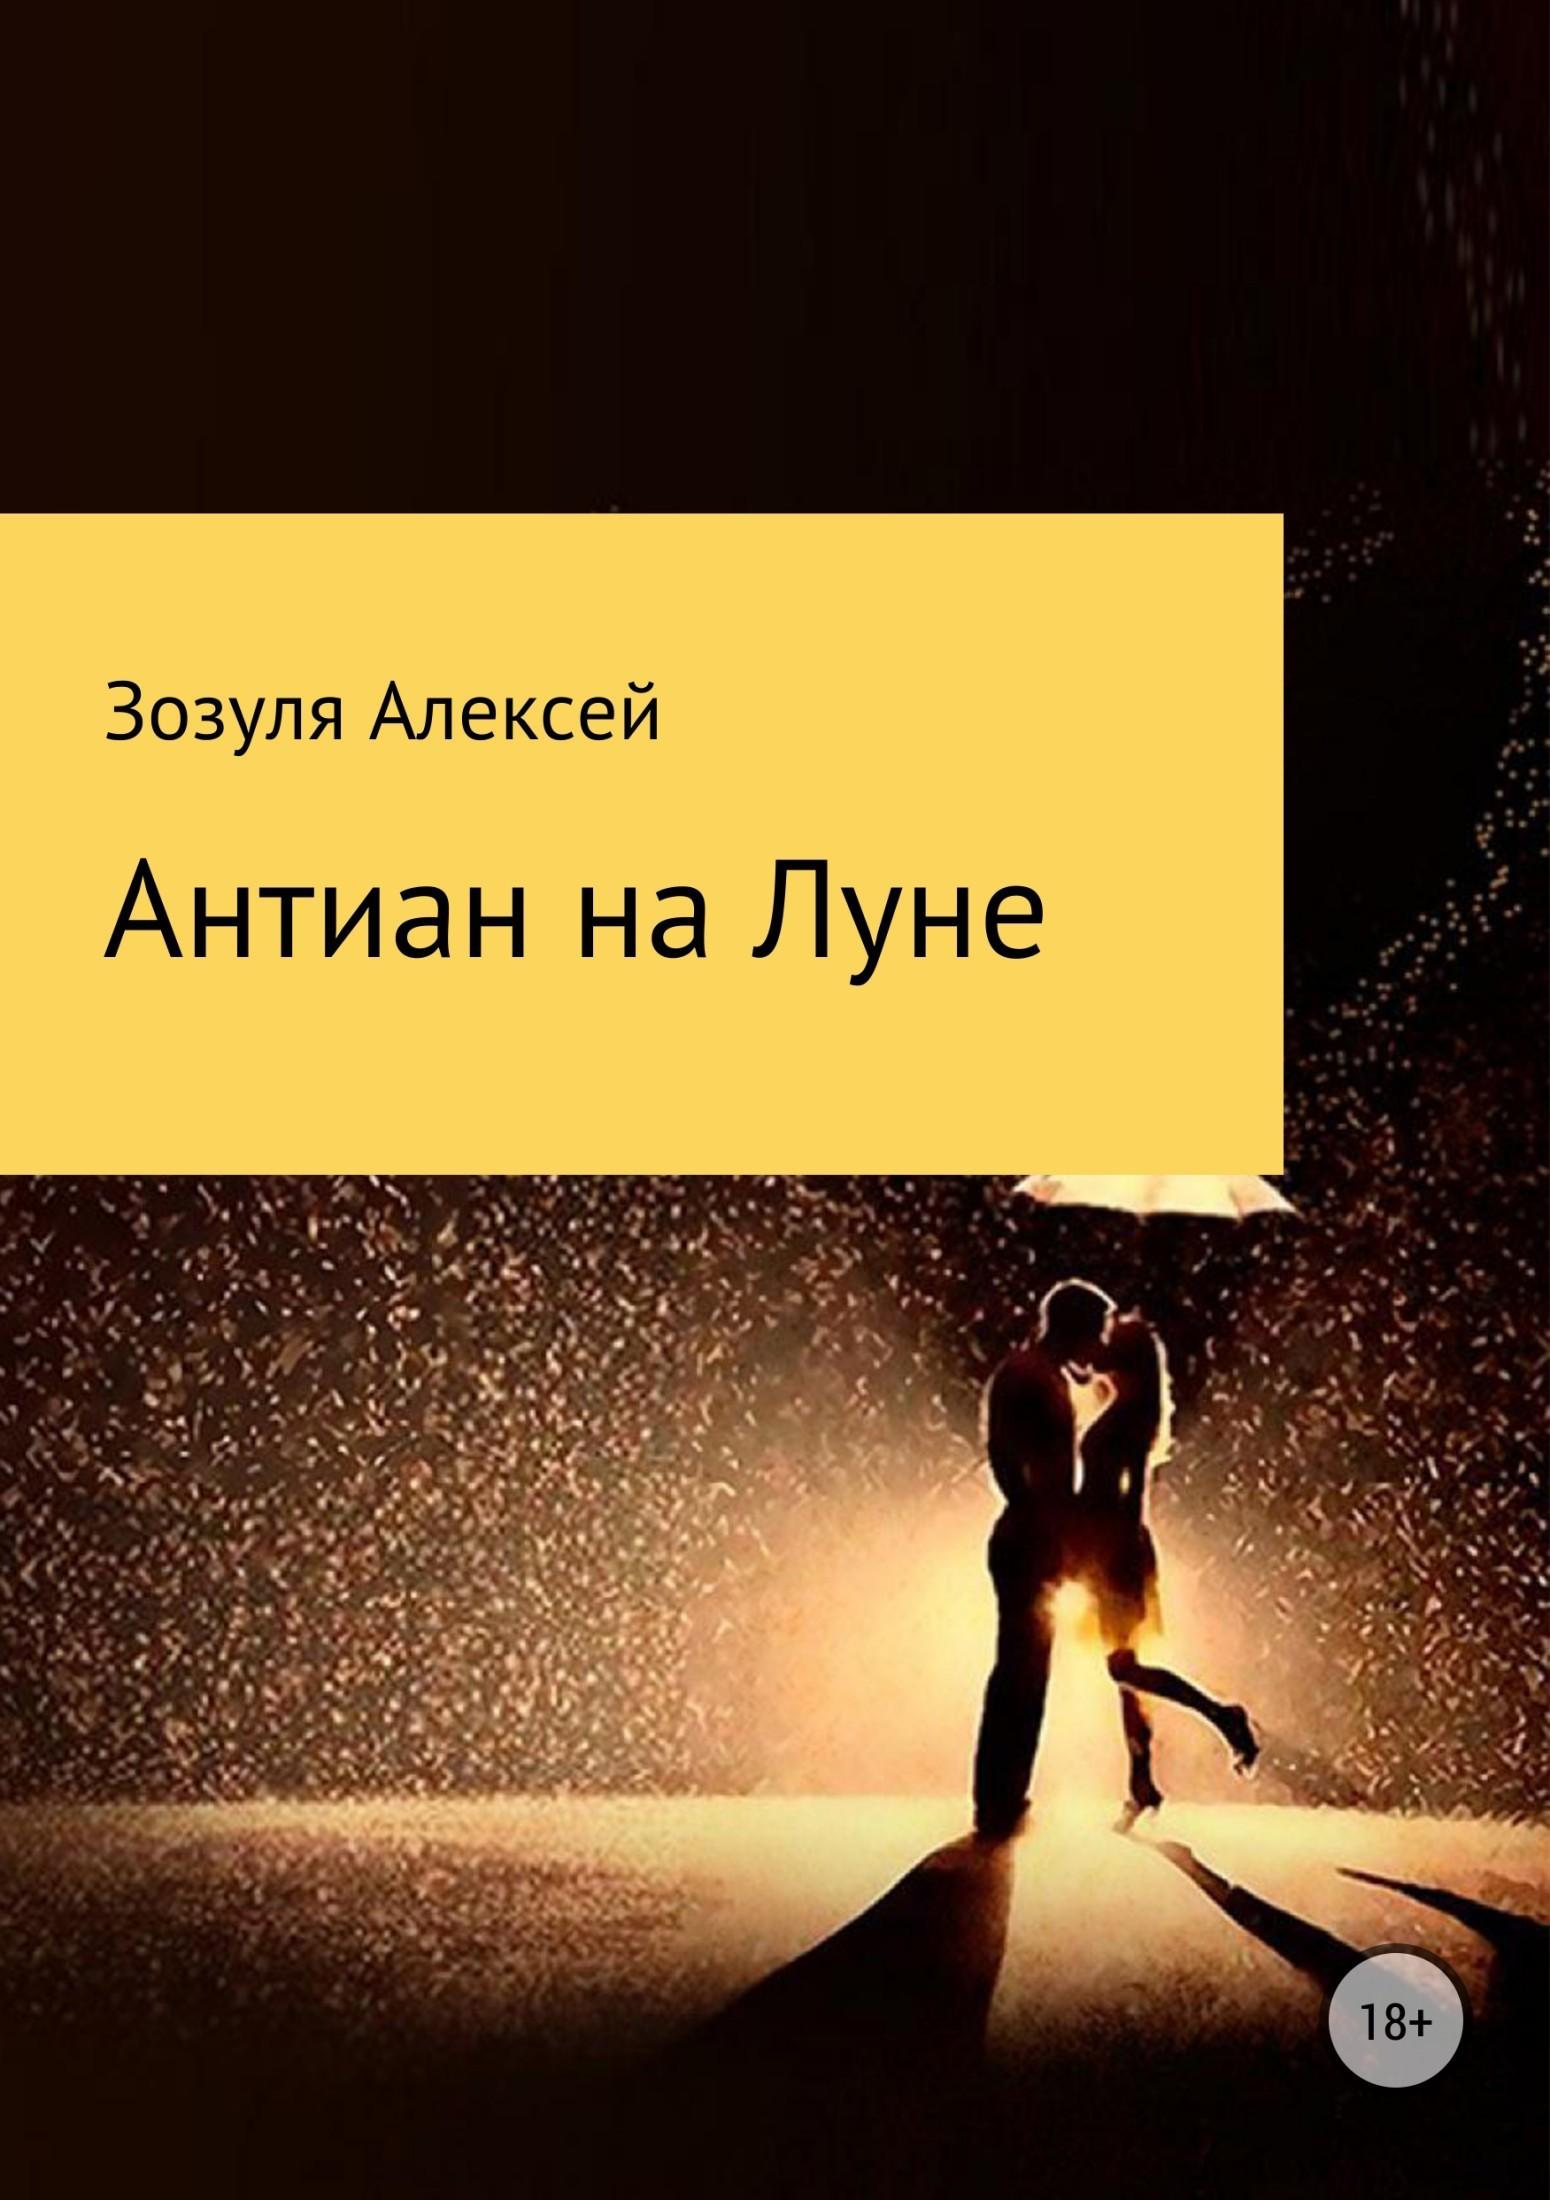 Алексей Юрьевич Зозуля Антиан на луне